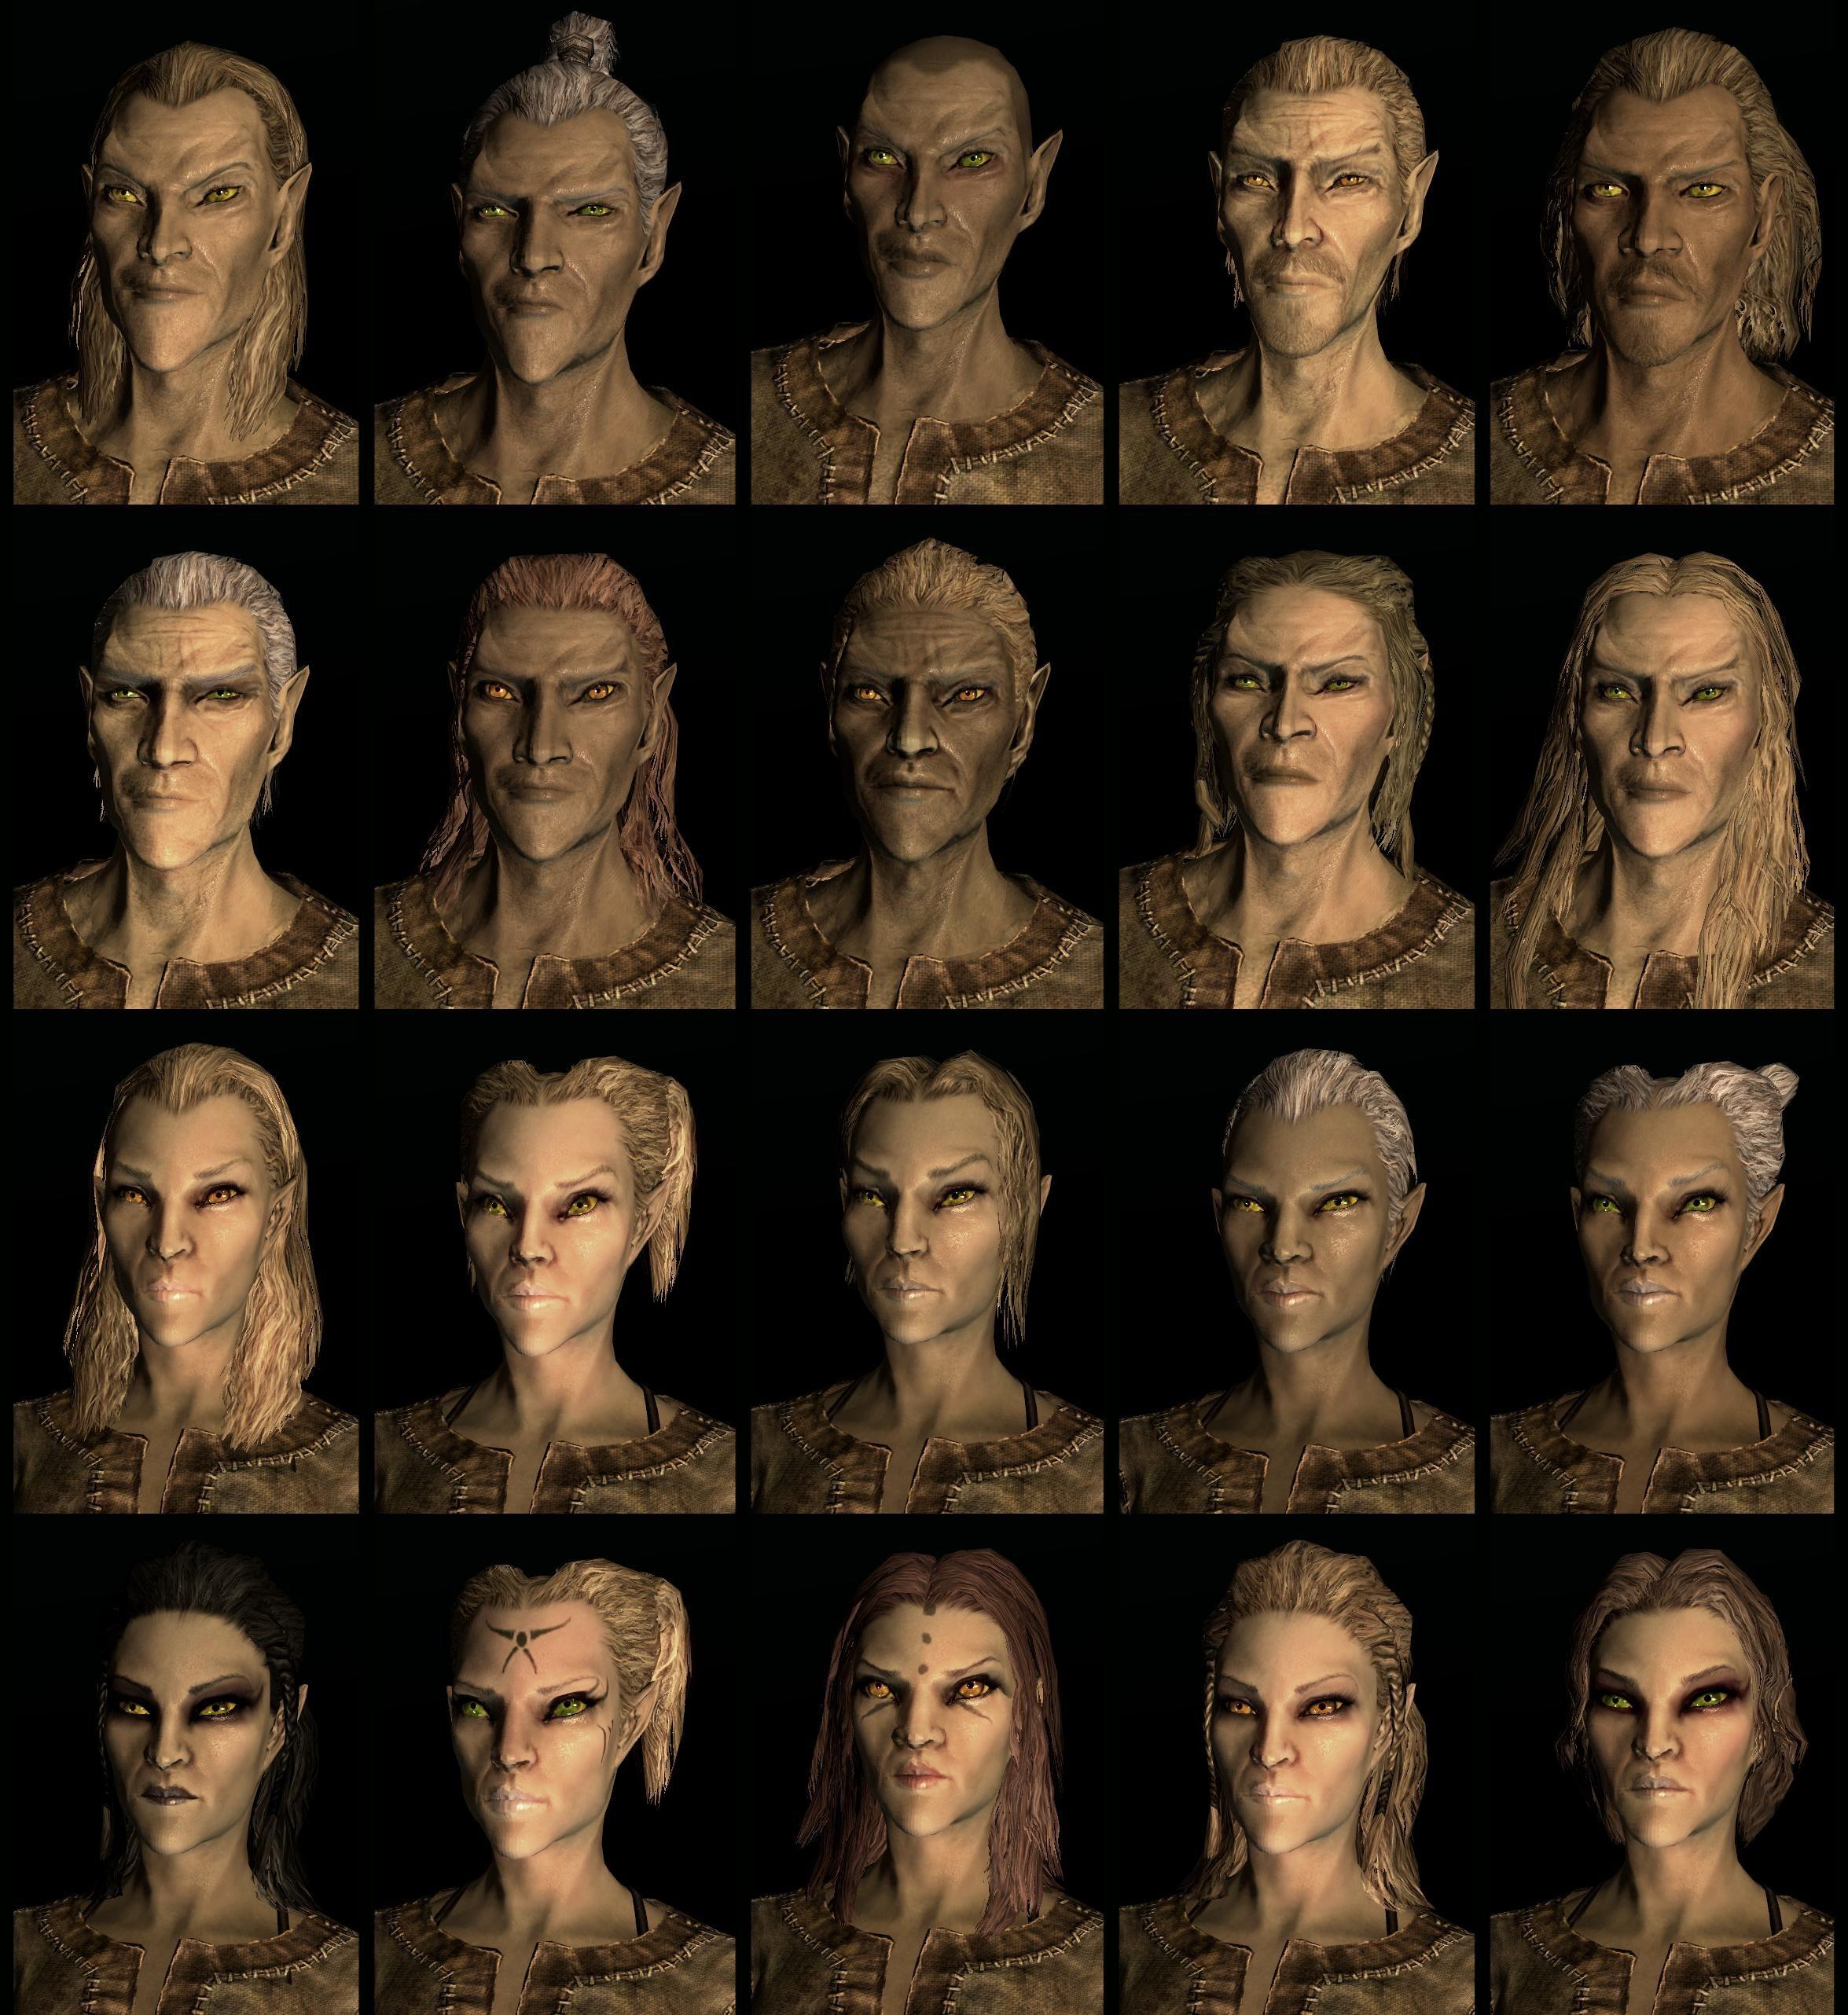 Skyrim Hairstyles And Face Markings Skyrim Elder Scrolls Skyrim Skyrim Races